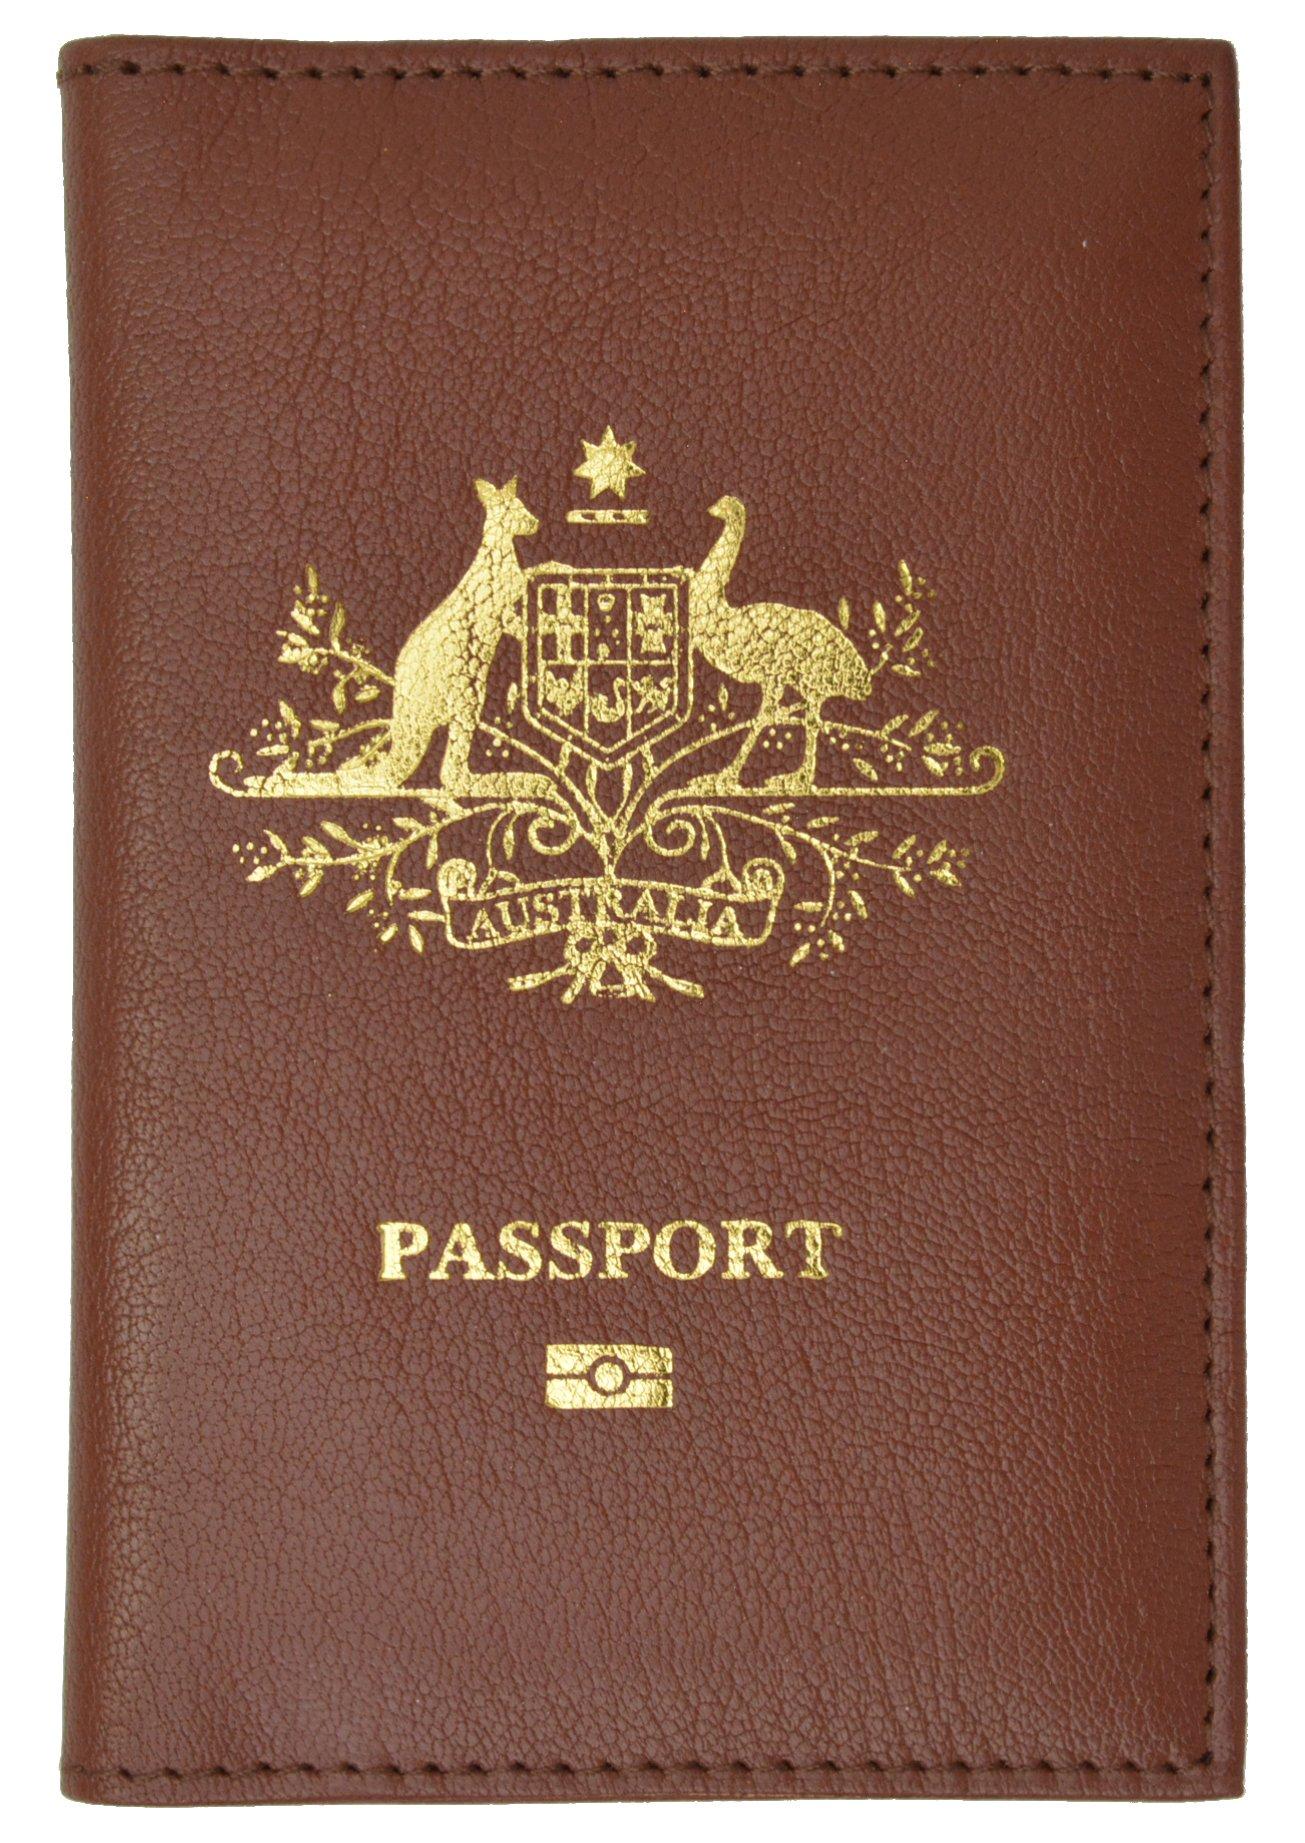 Australia Passport Cover Genuine Leather Passport Wallet for Travel (Burgundy)